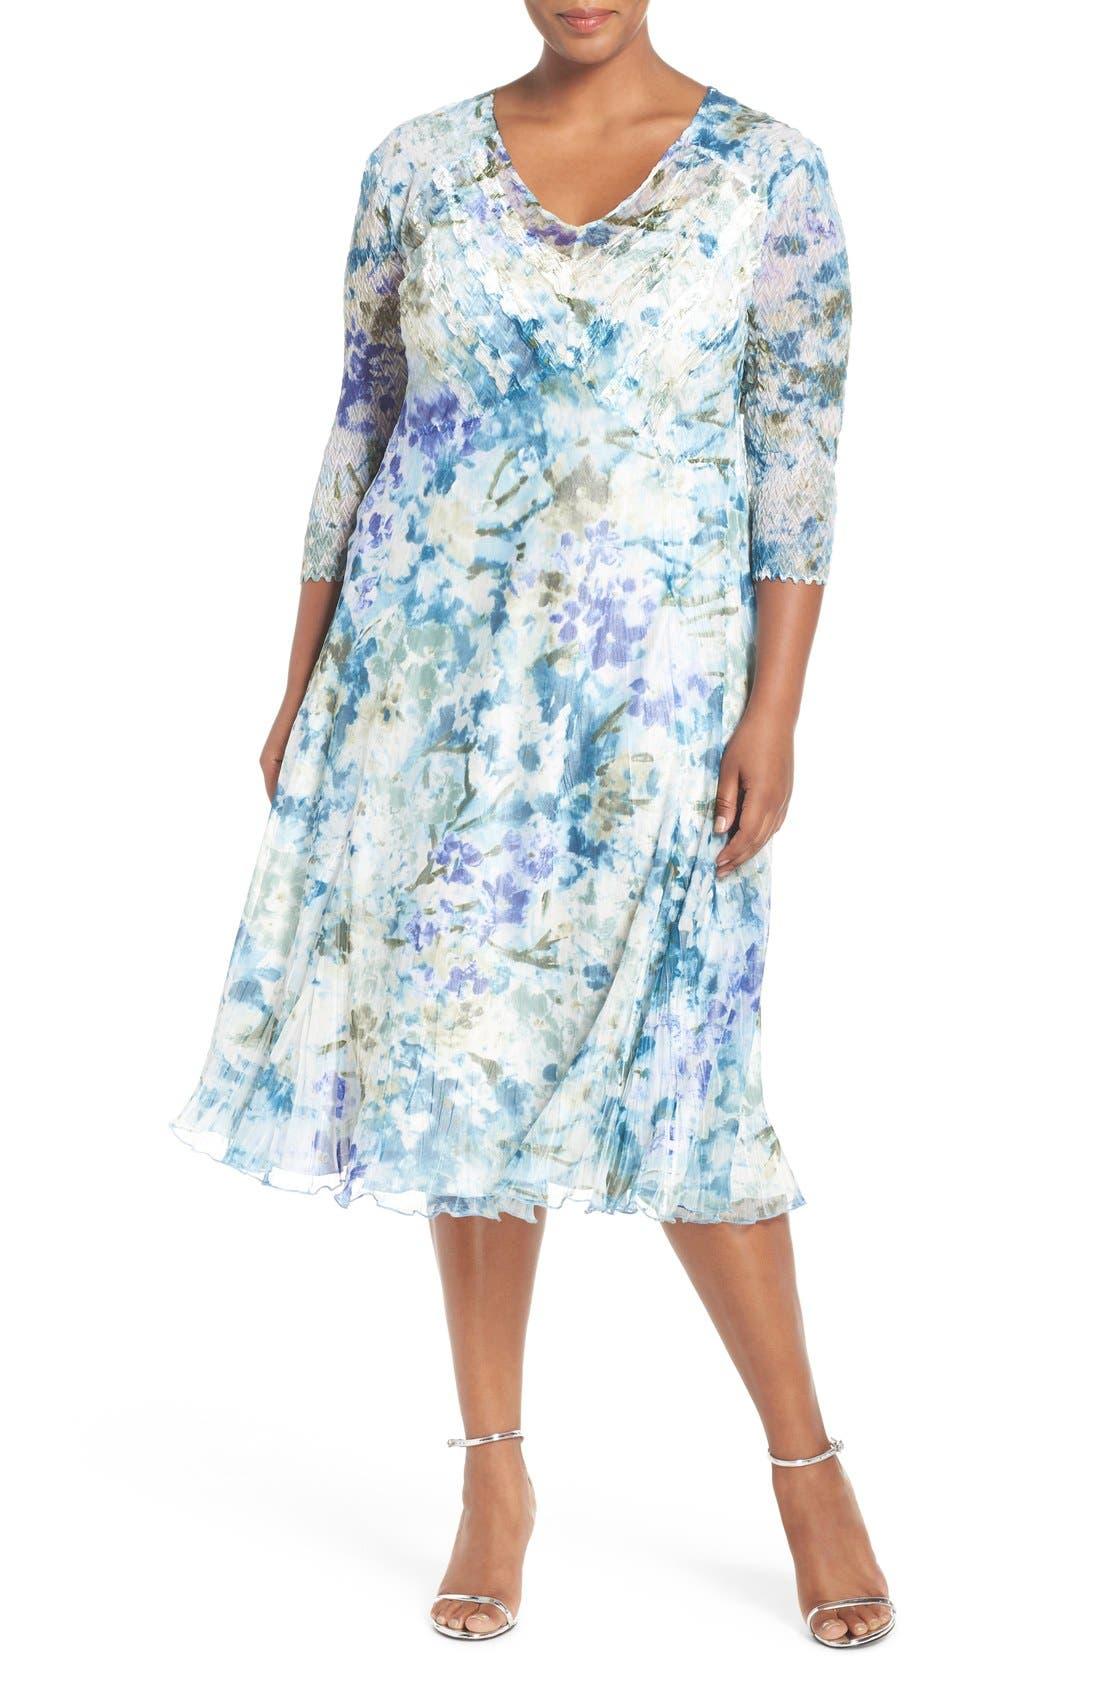 Alternate Image 1 Selected - Komarov Print Three-Quarter Sleeve Chiffon A-Line Dress (Plus Size)